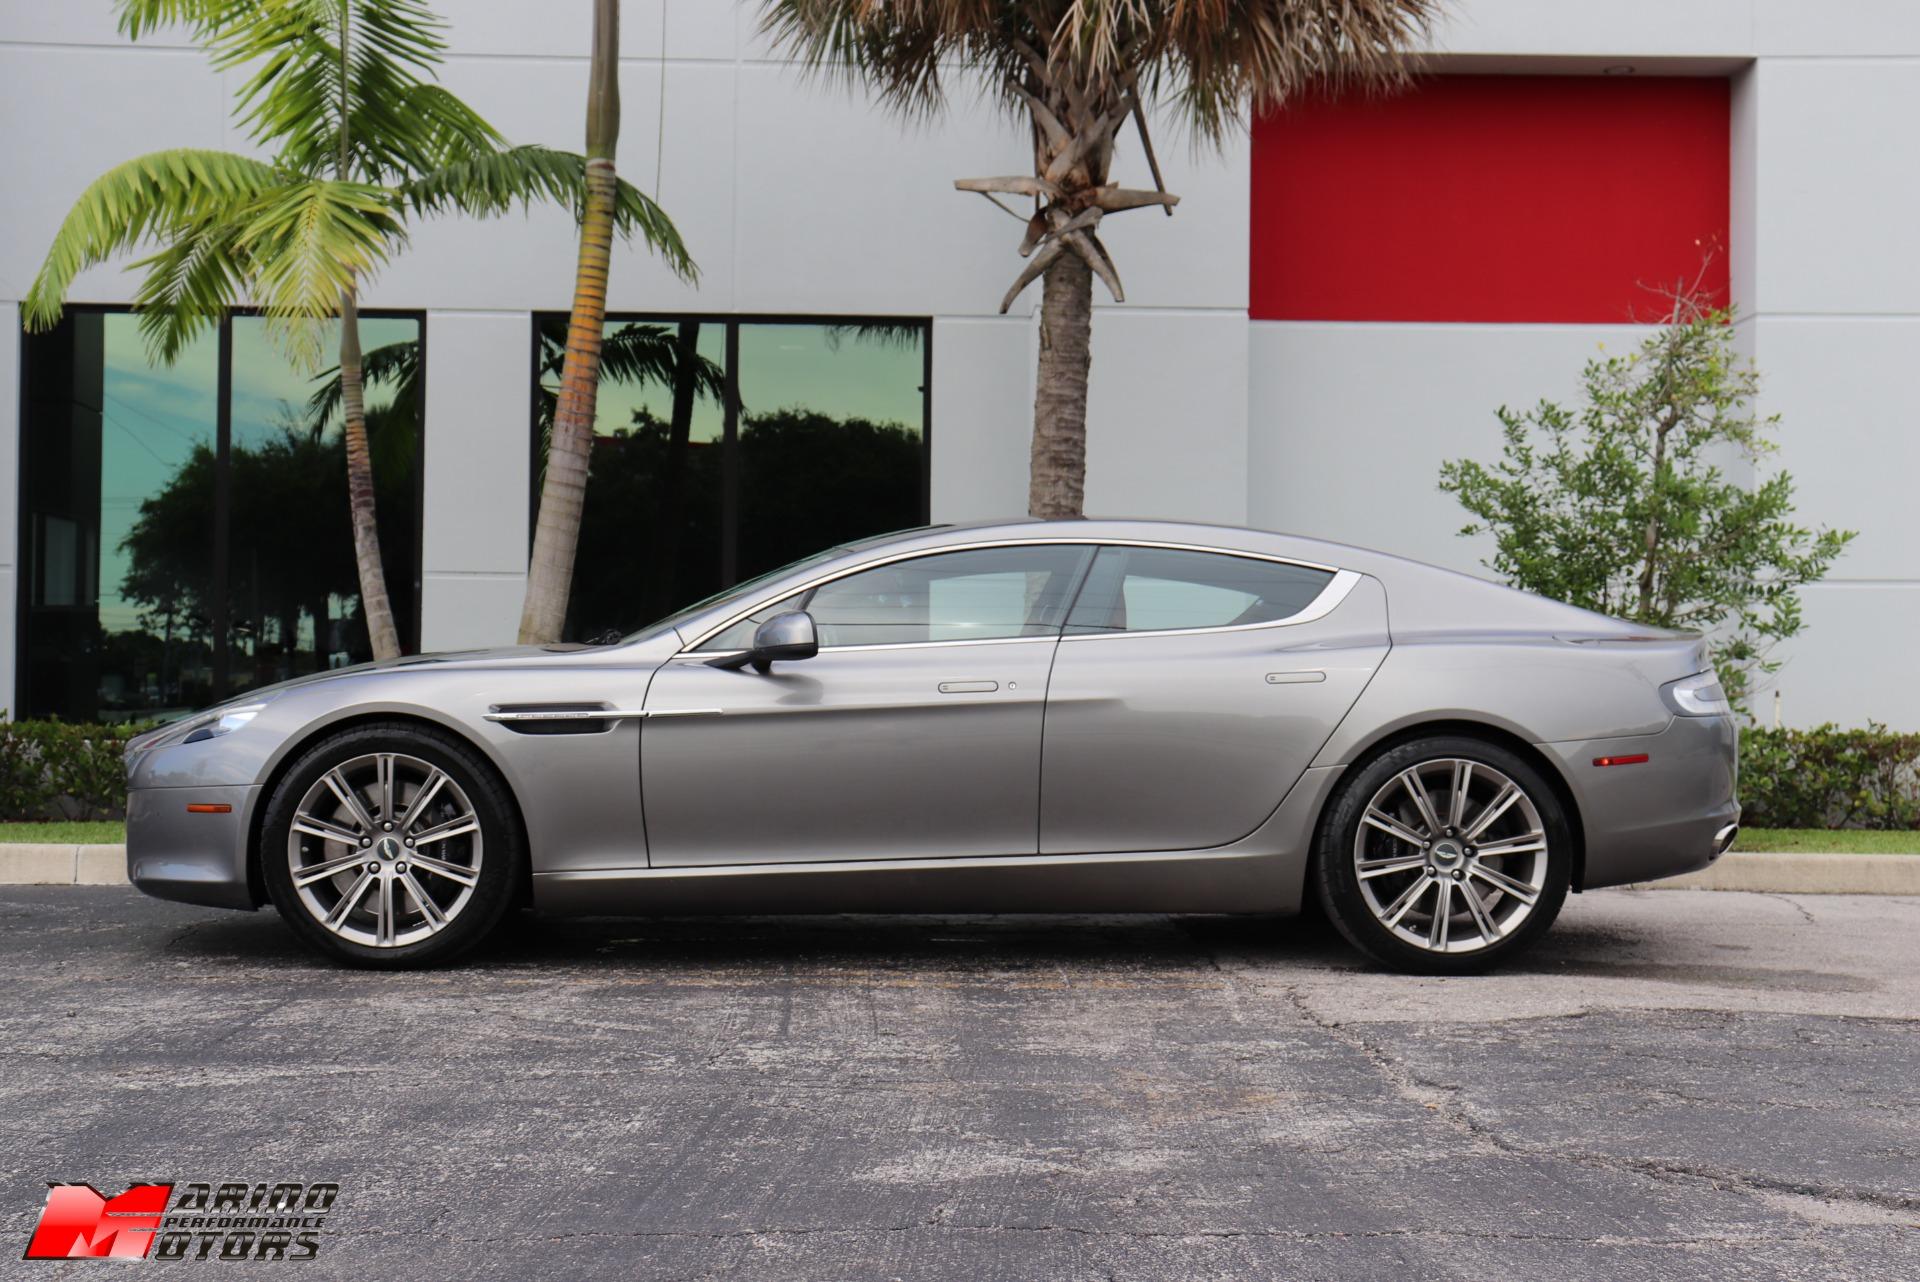 Used-2010-Aston-Martin-Rapide